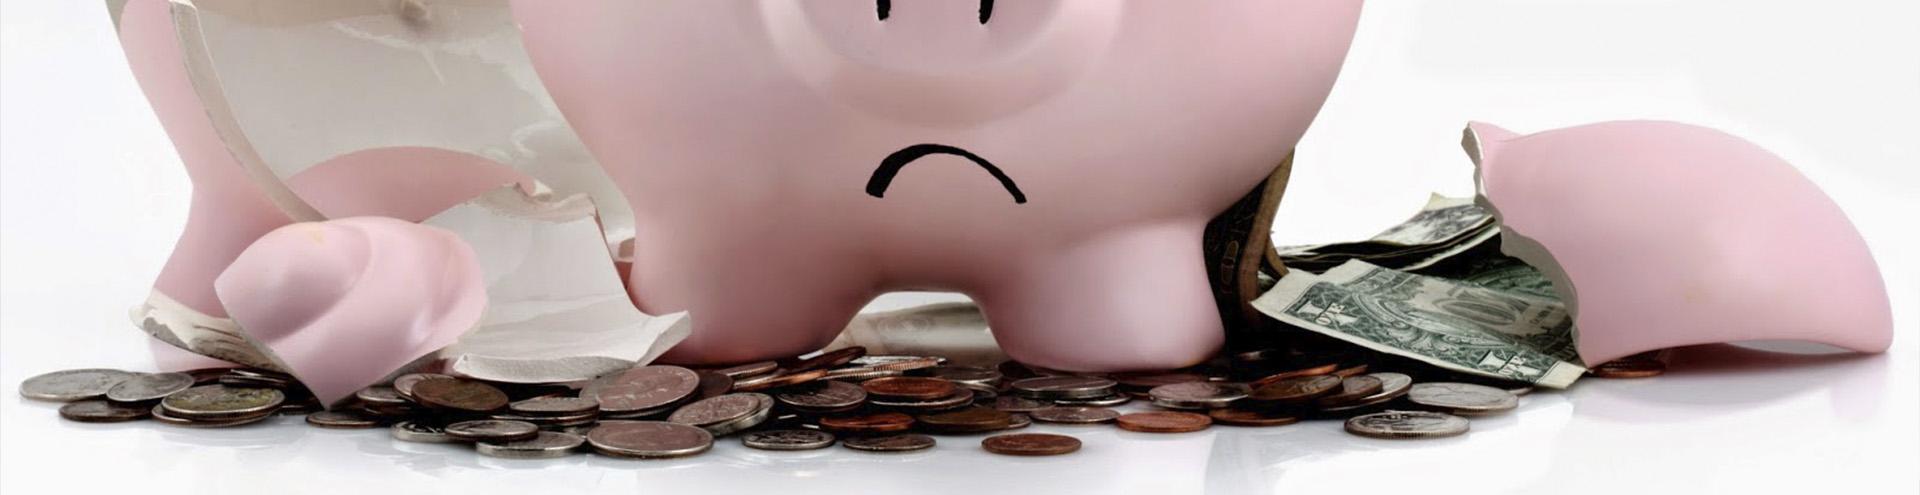 банкротство банка в Краснодаре